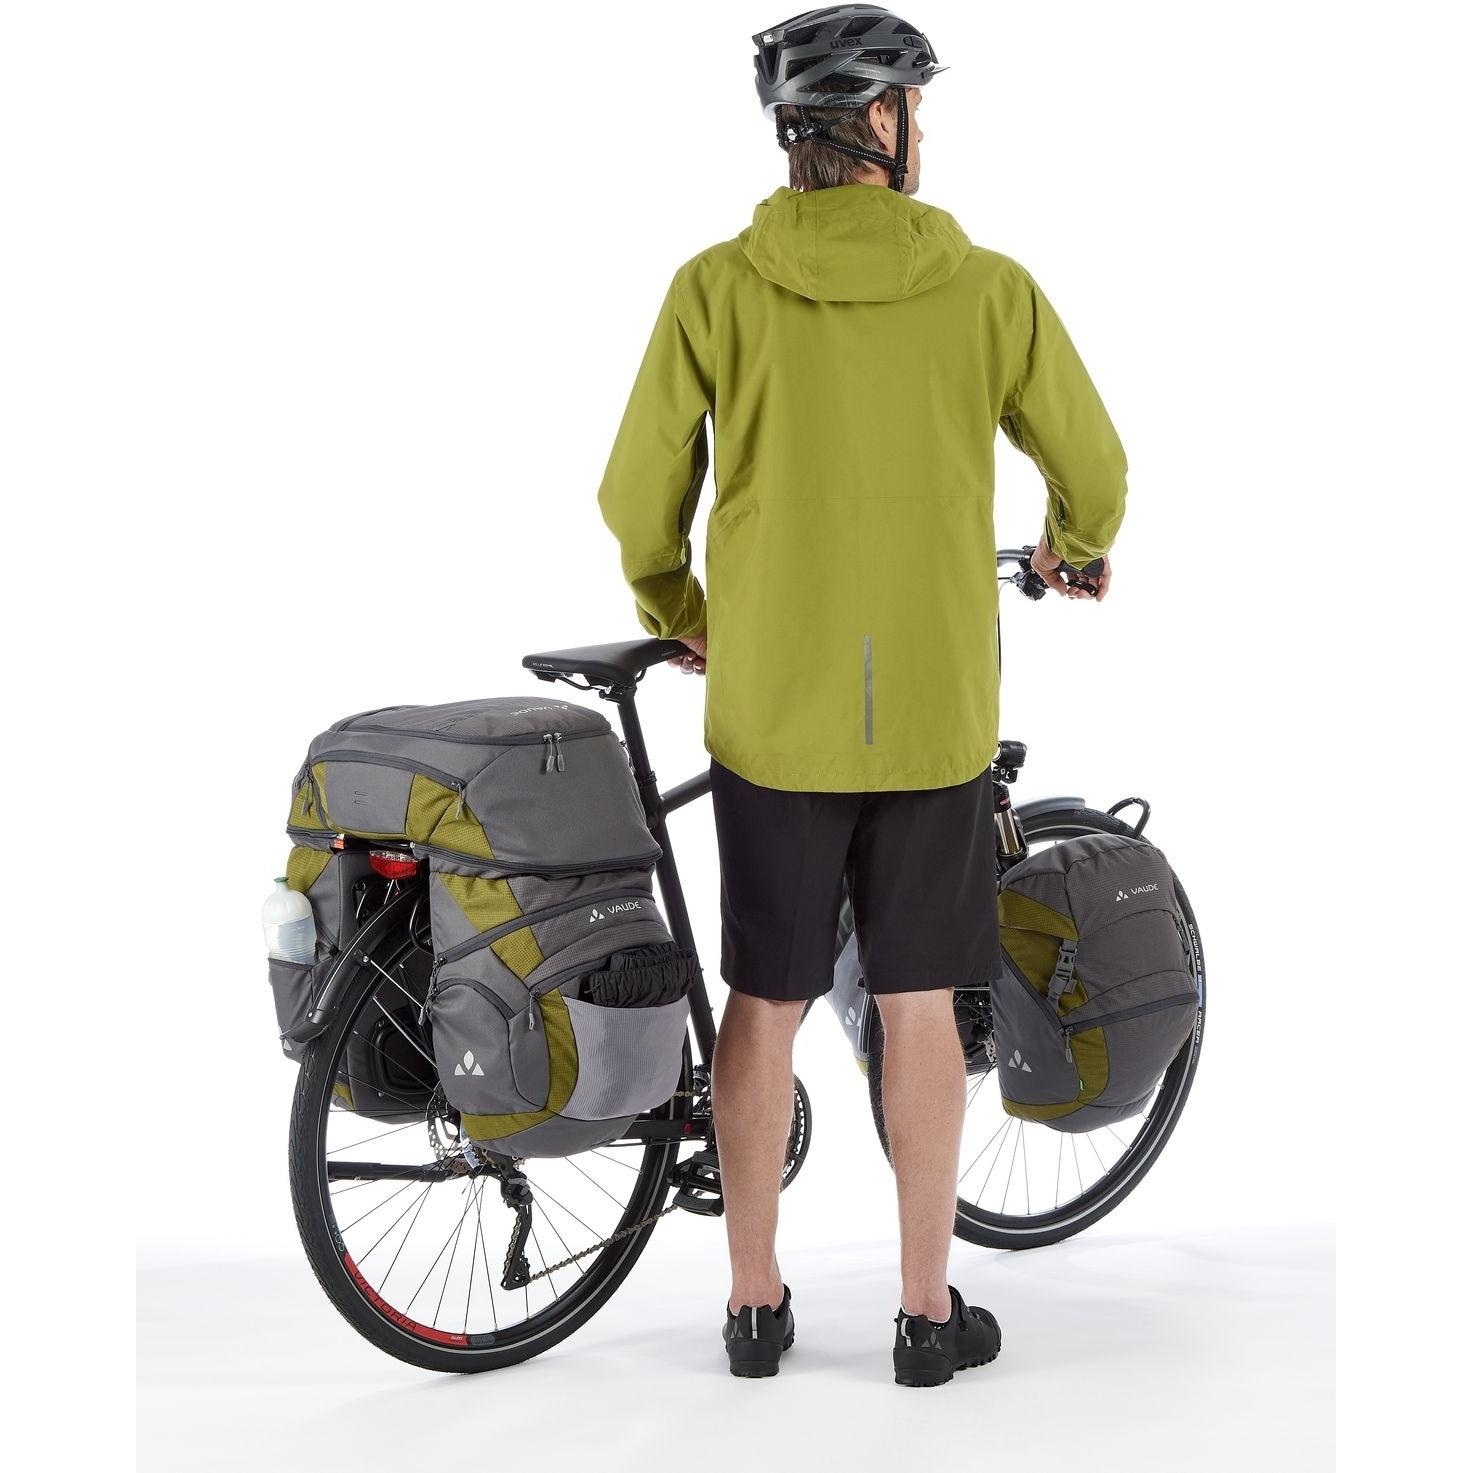 Image of Vaude Karakorum Pro Back Bike Pannier (Pair + Top Case) - black